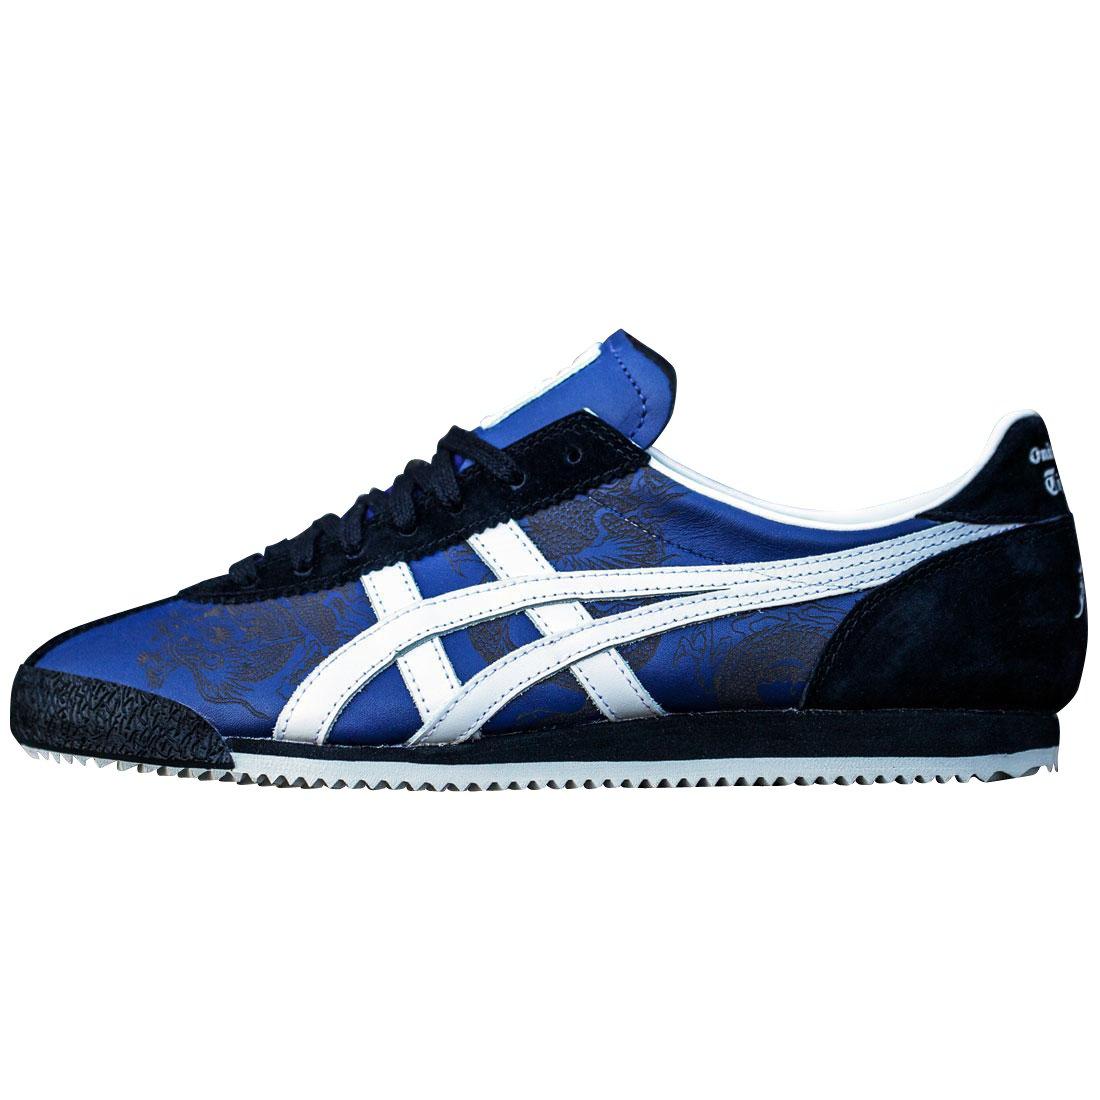 online store 55b45 14d74 Onitsuka Tiger Bait x Bruce Lee x Men Tiger Corsair - Jeet Kune Do Size 5.5  US, Navy White  Amazon.co.uk  Shoes   Bags